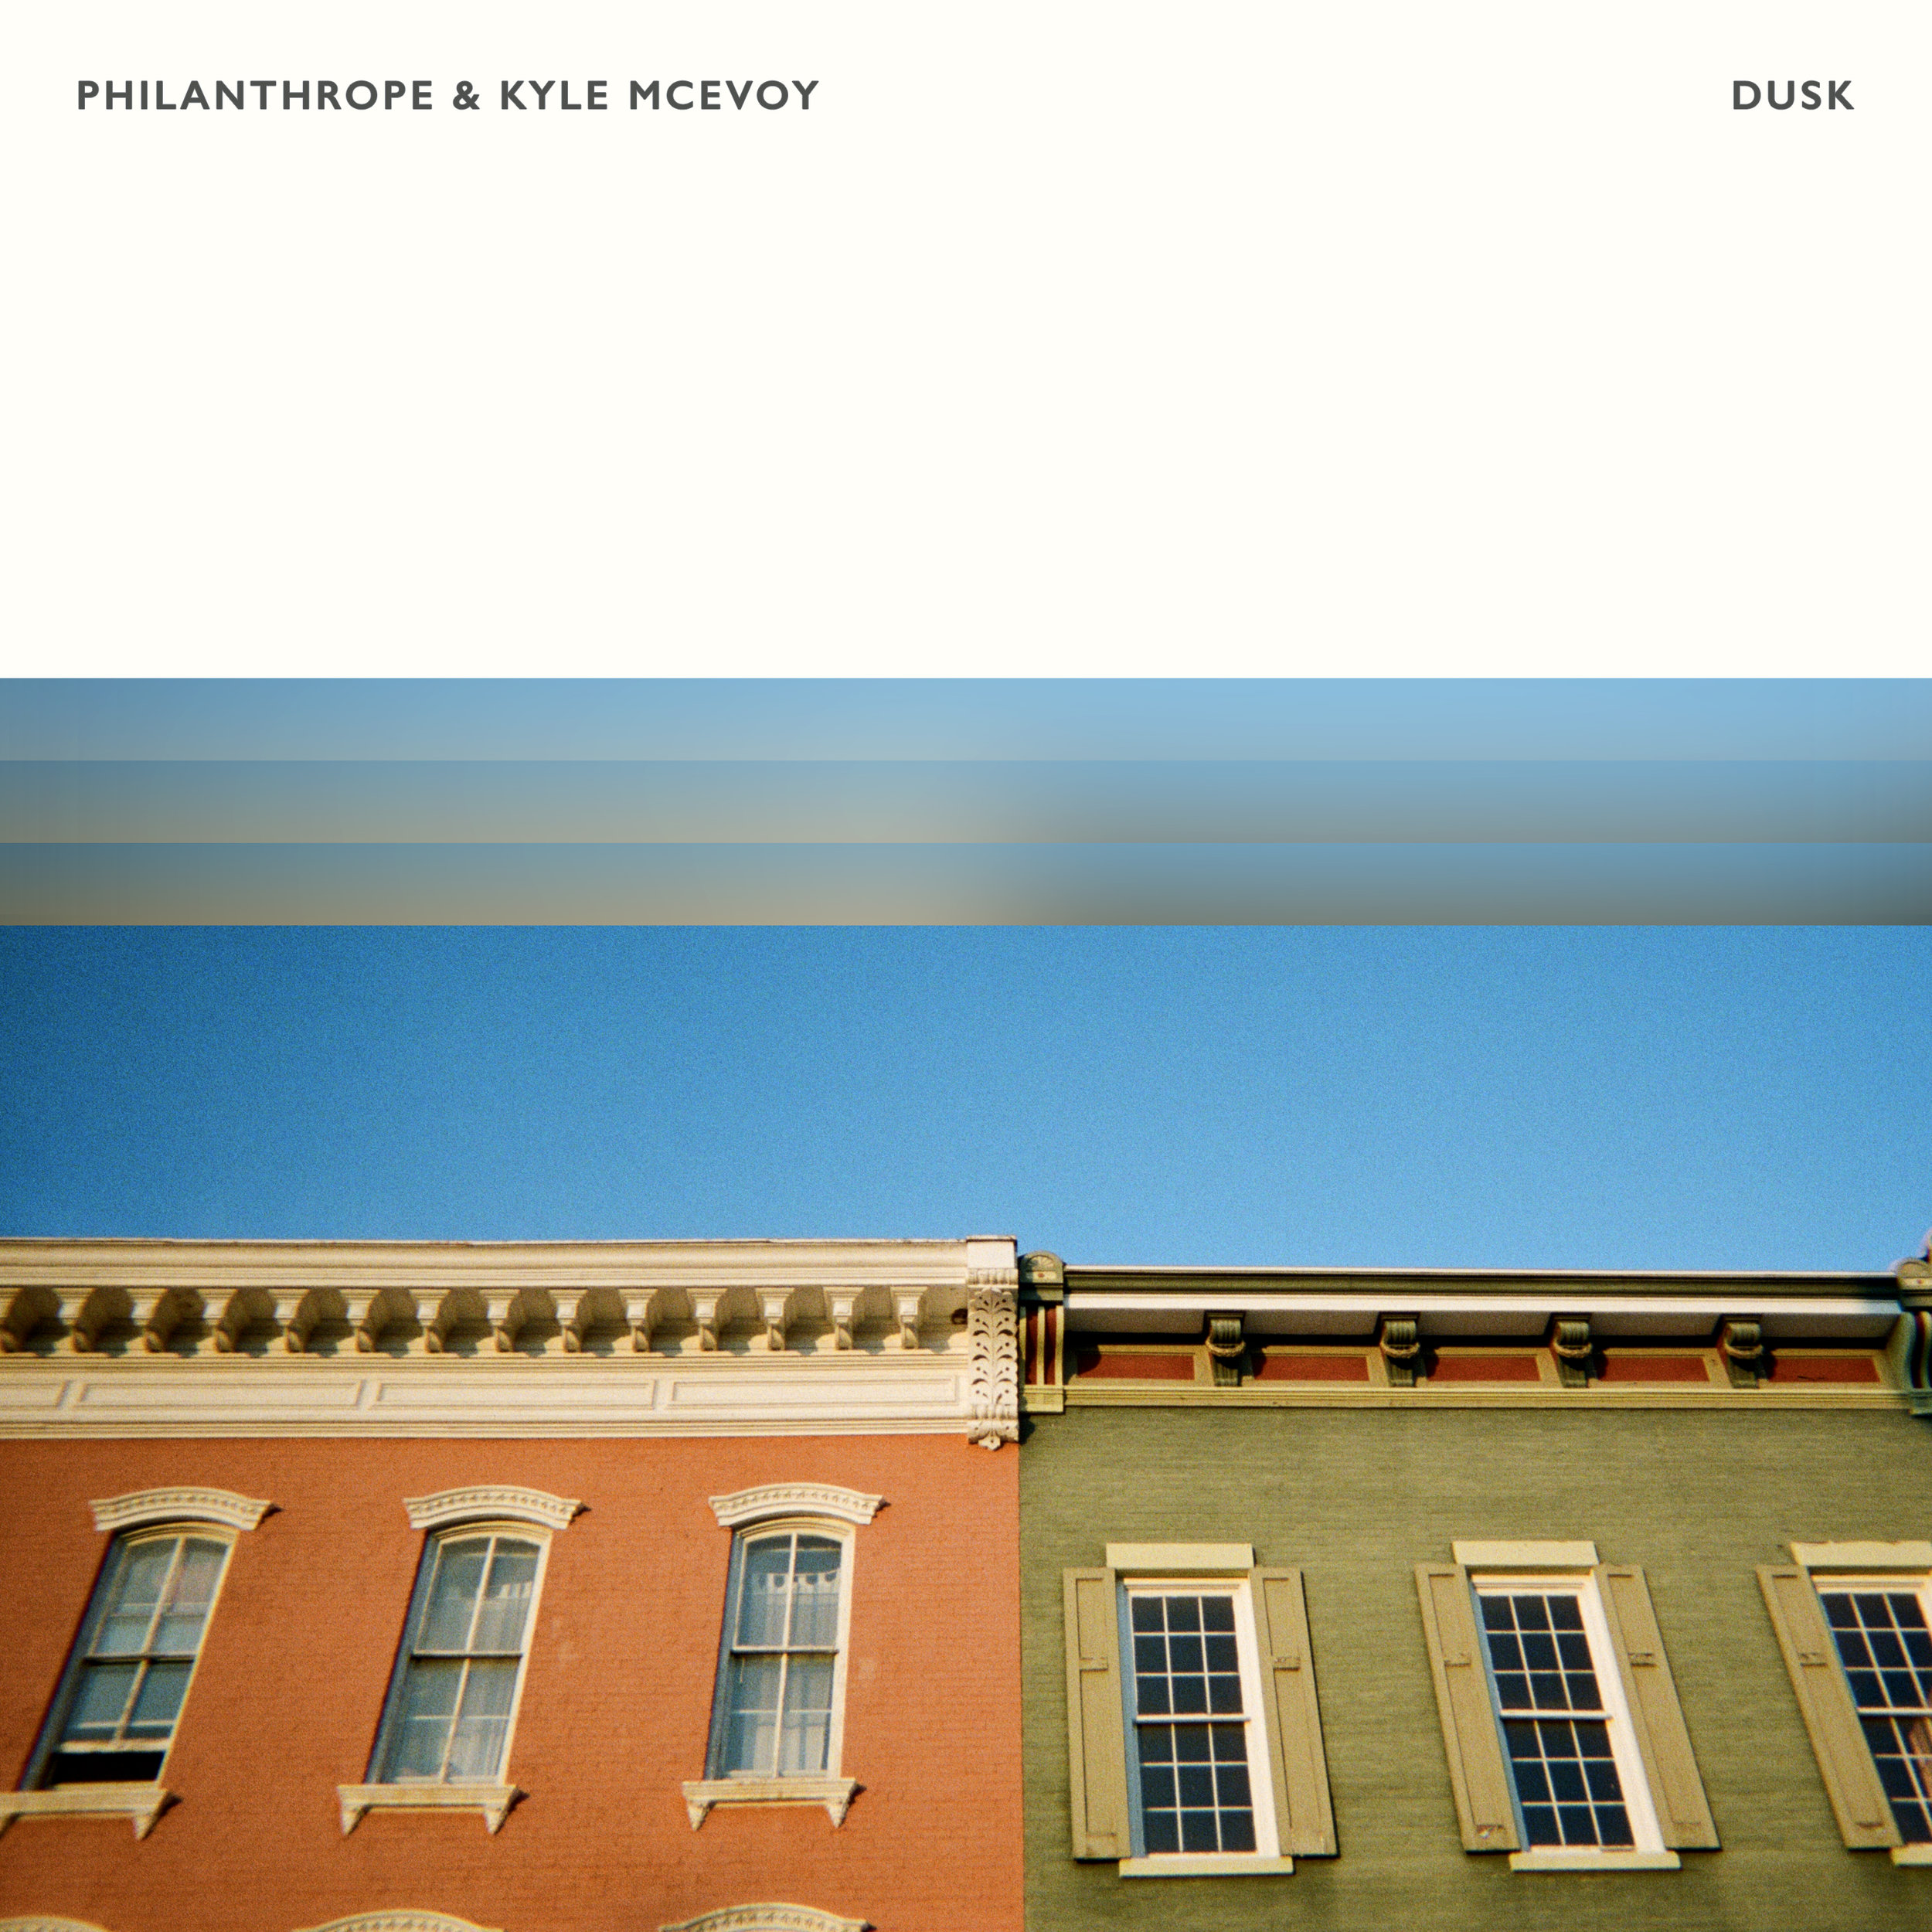 Philanthrope & Kyle McEvoy - Dusk